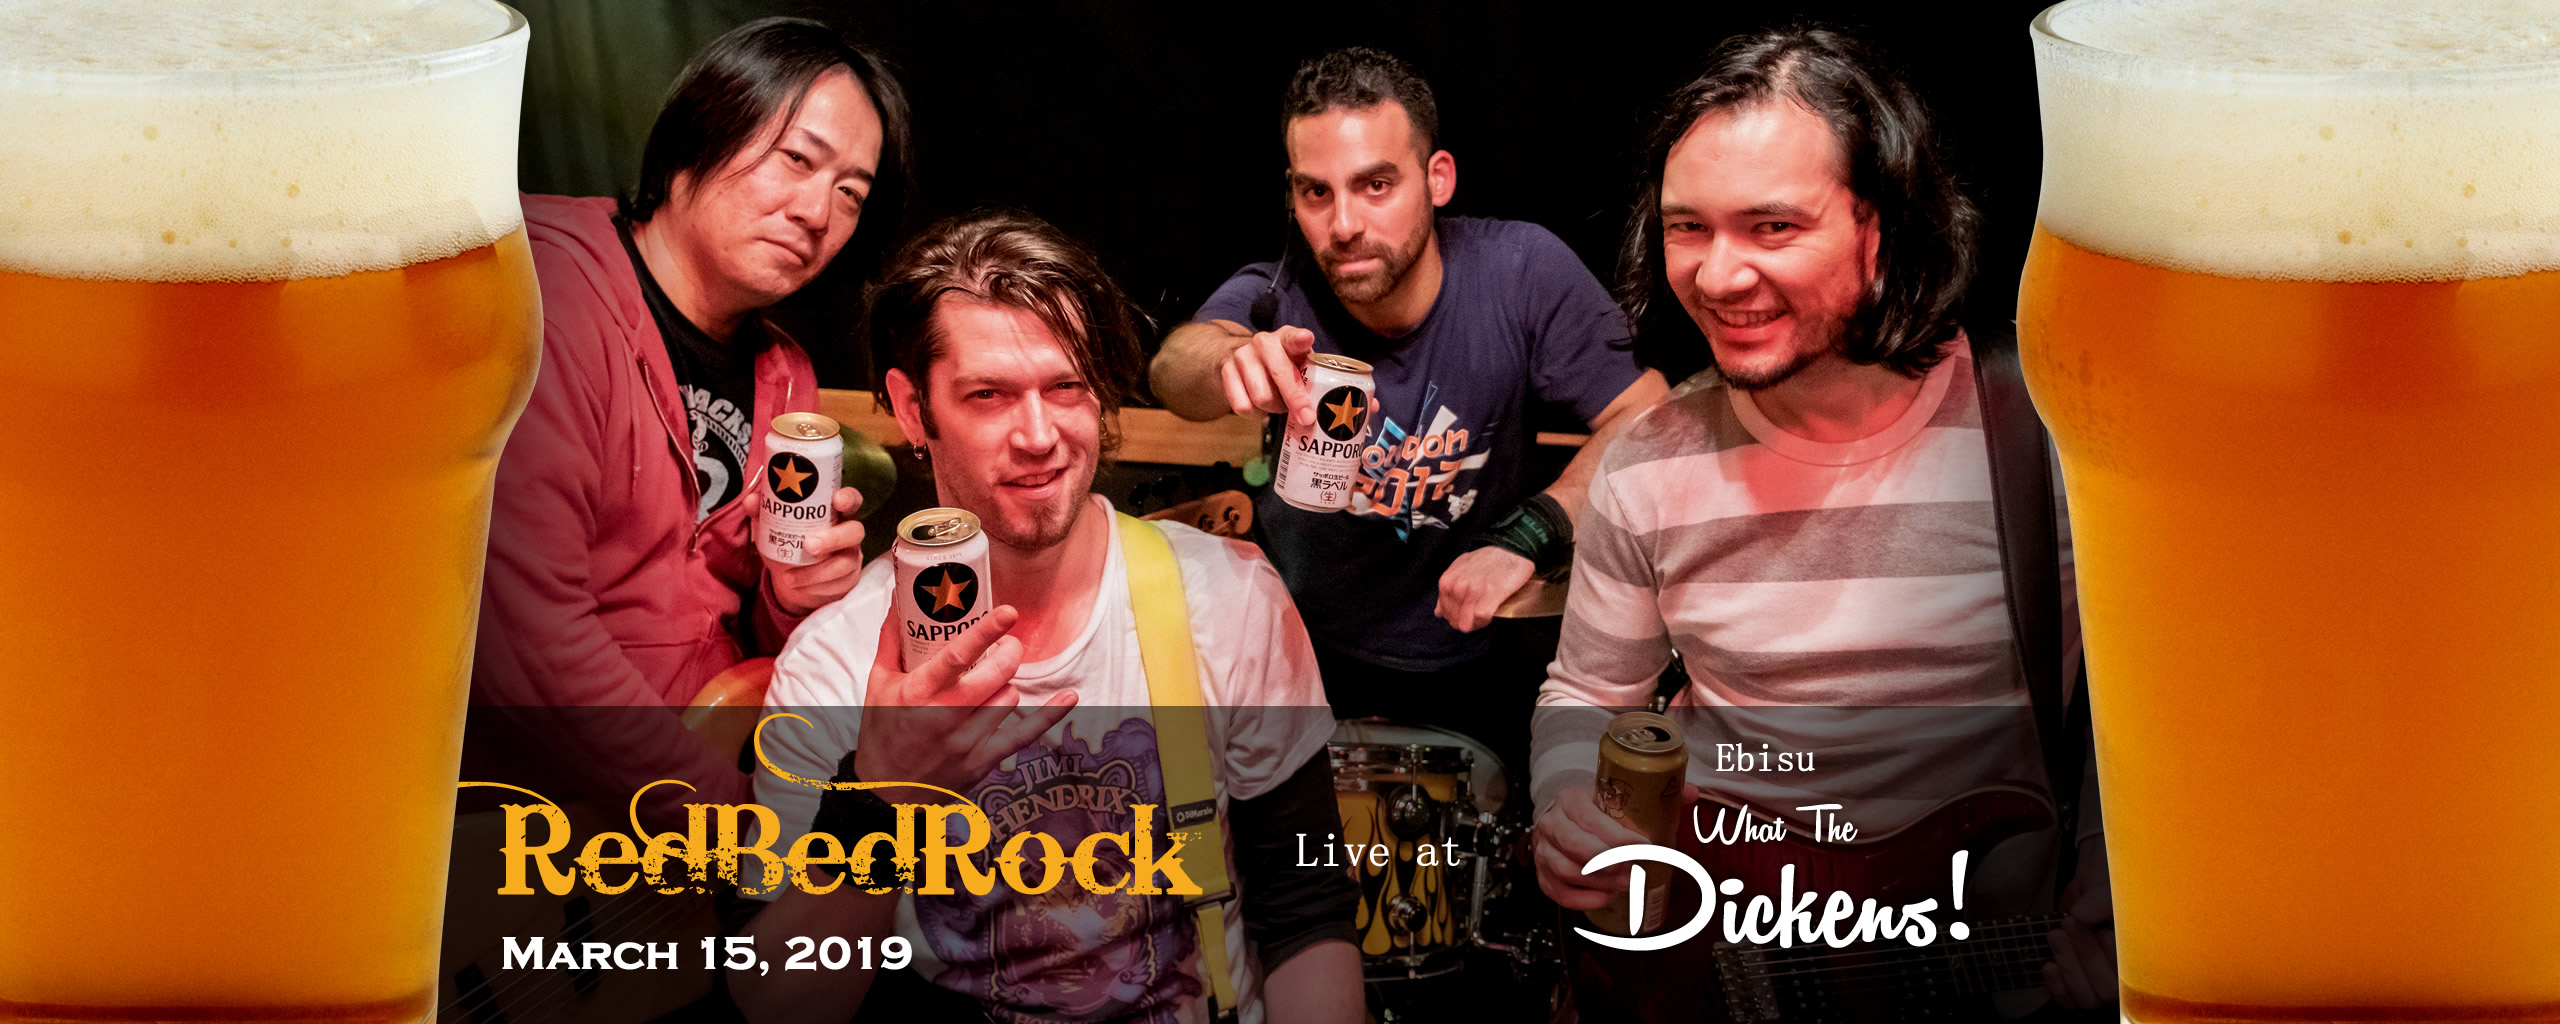 RedBedRock Celebrating Beer!